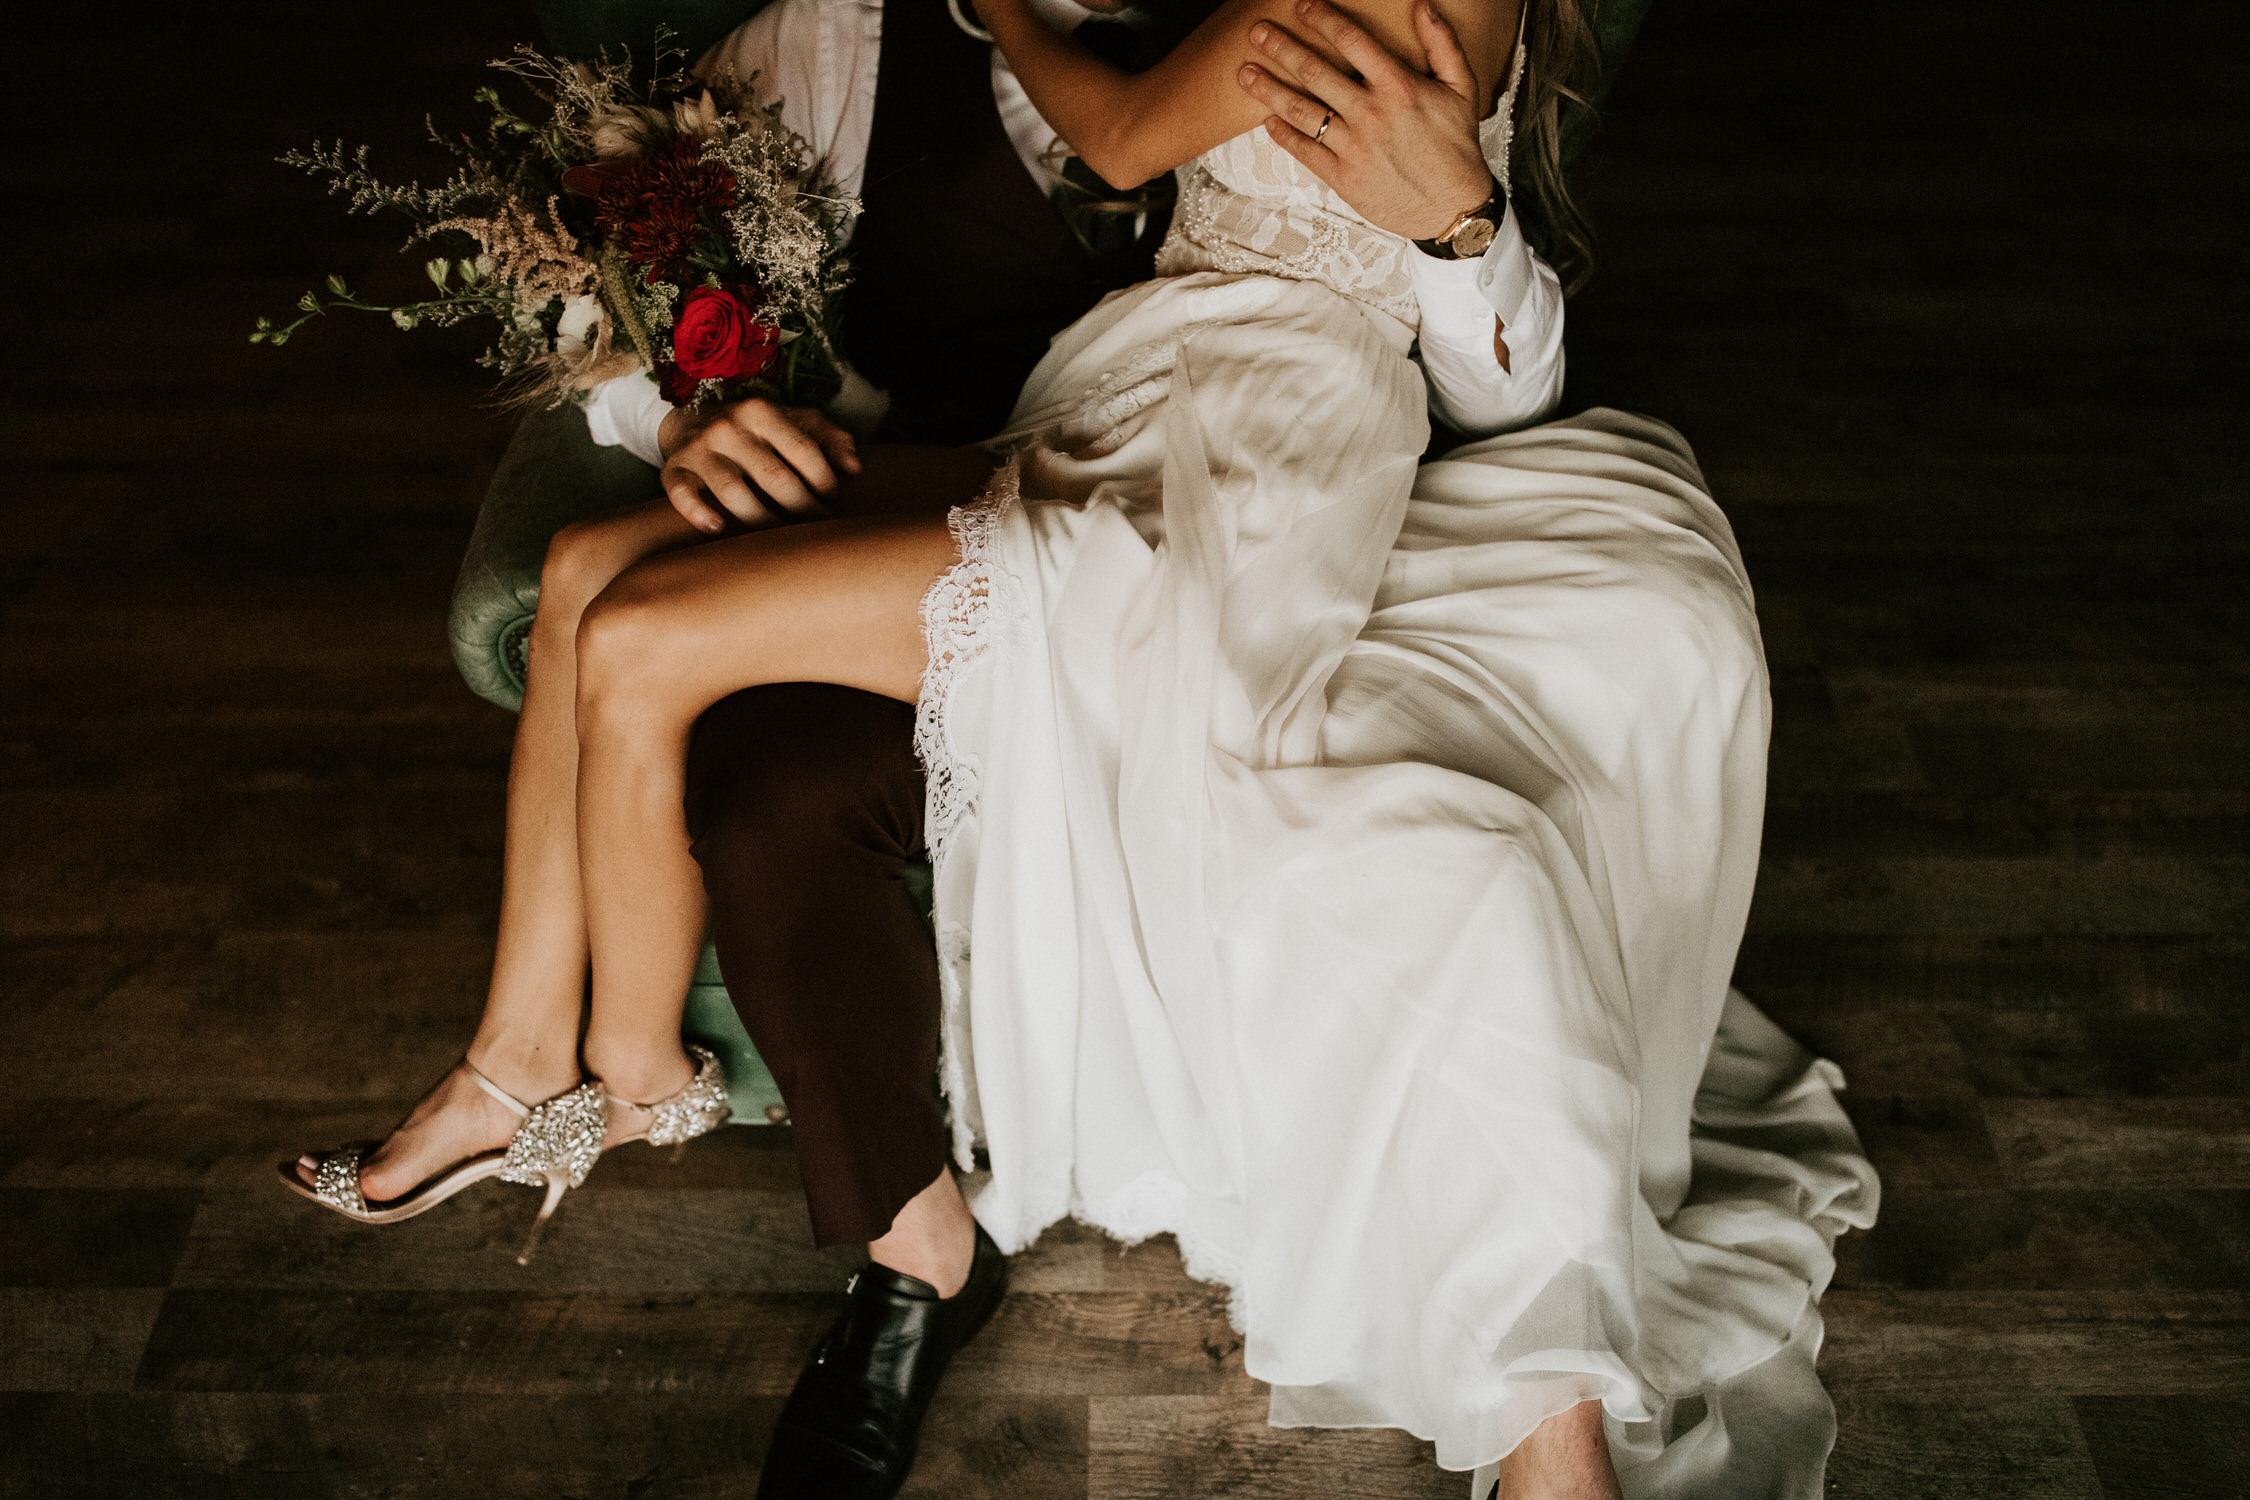 couple-intimate-wedding-northern-california-174.jpg